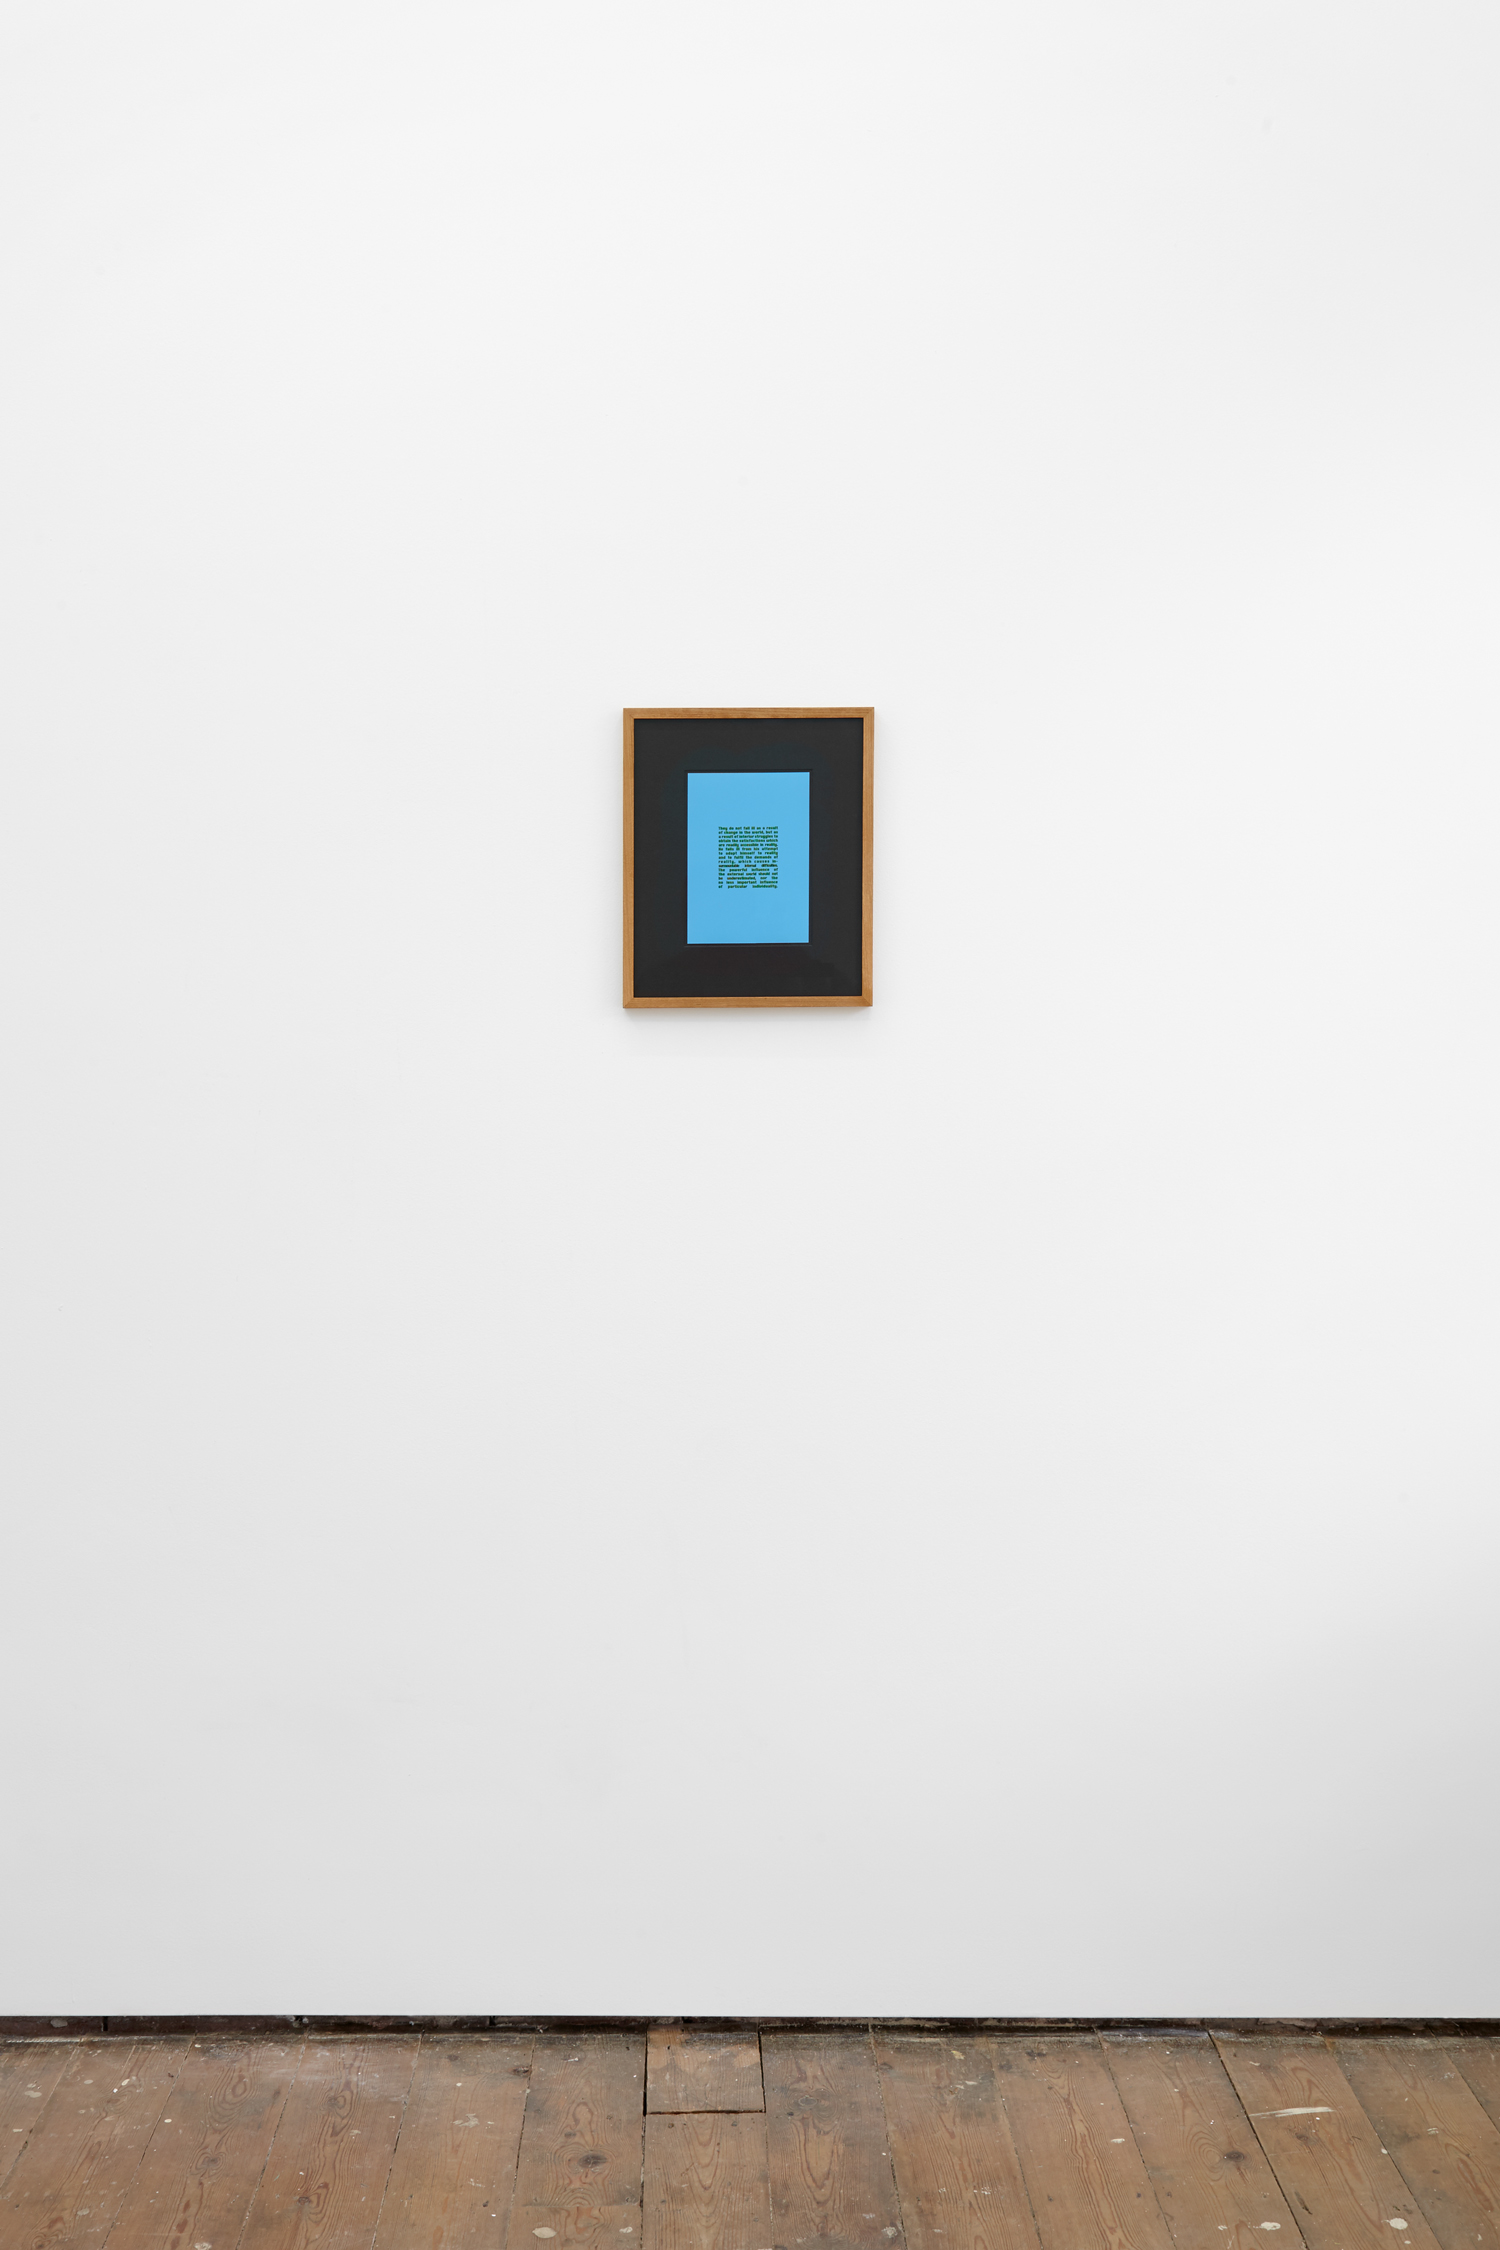 Anna Susanna Woof  Untitled  2016 Framed C-print 21 x 14.8 cm